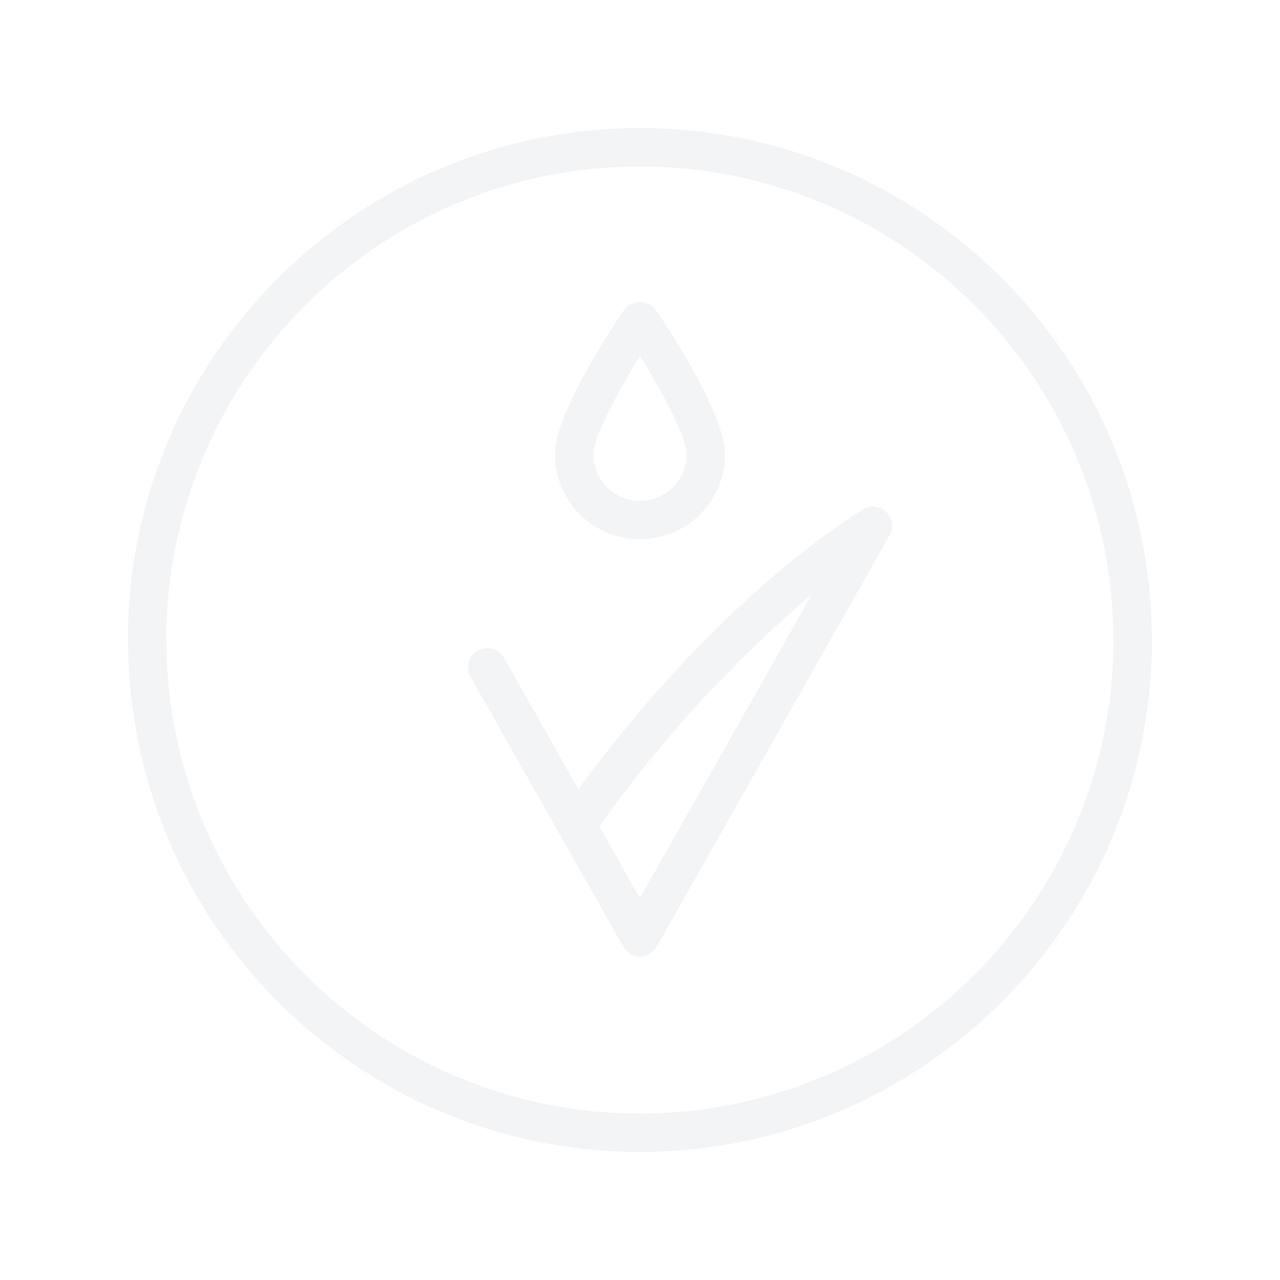 MISSHA Pro-Touch Face Powder SPF15 14g